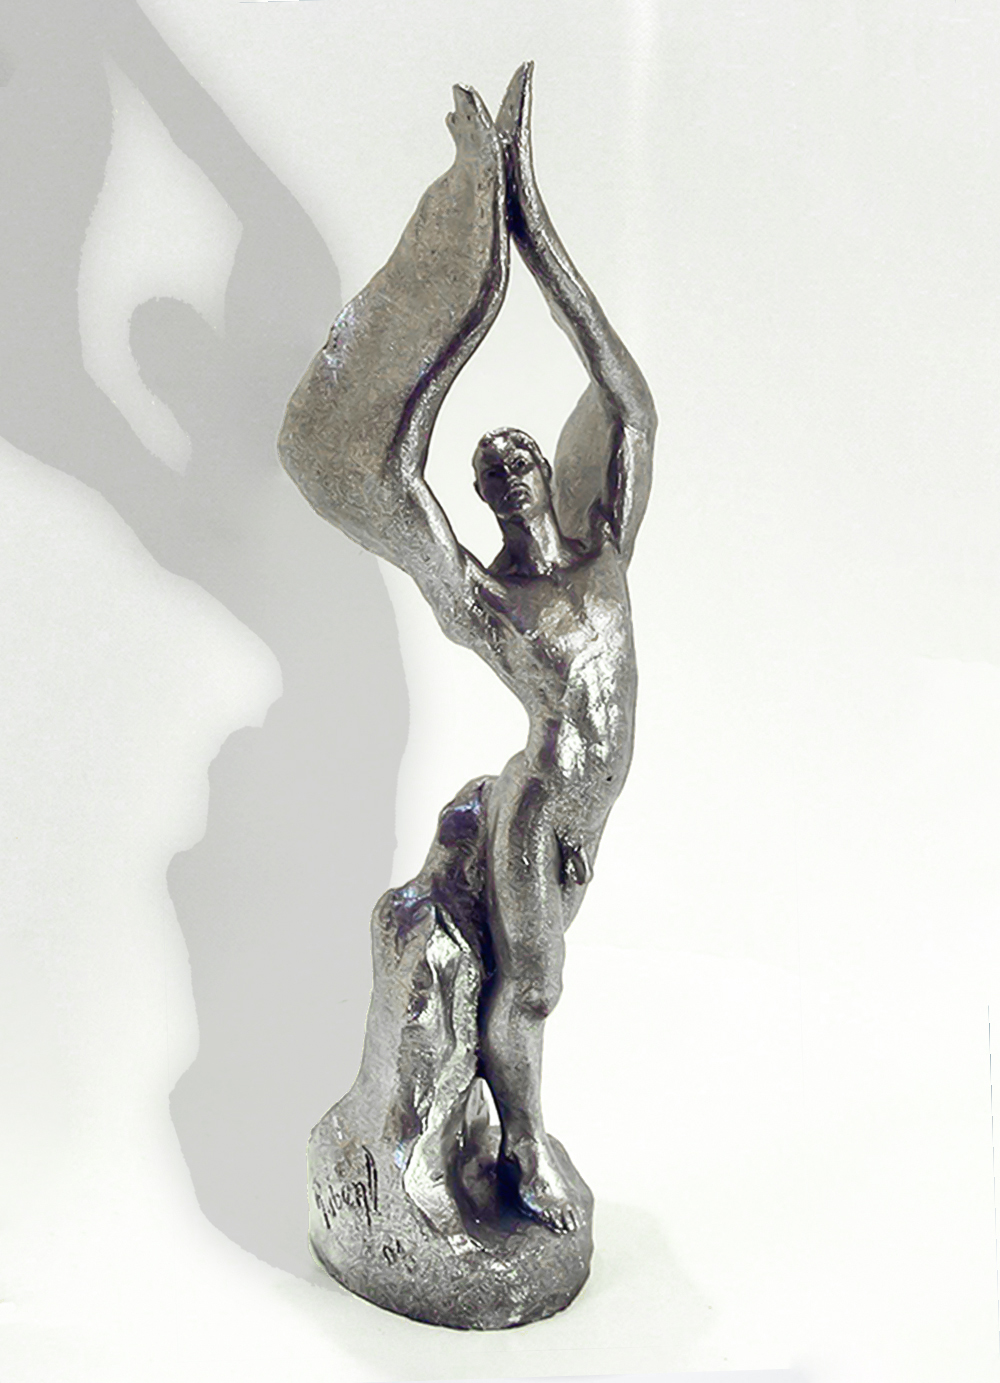 Escultura-Arcangel-A-Figurativo-Realista-RD.Escultor